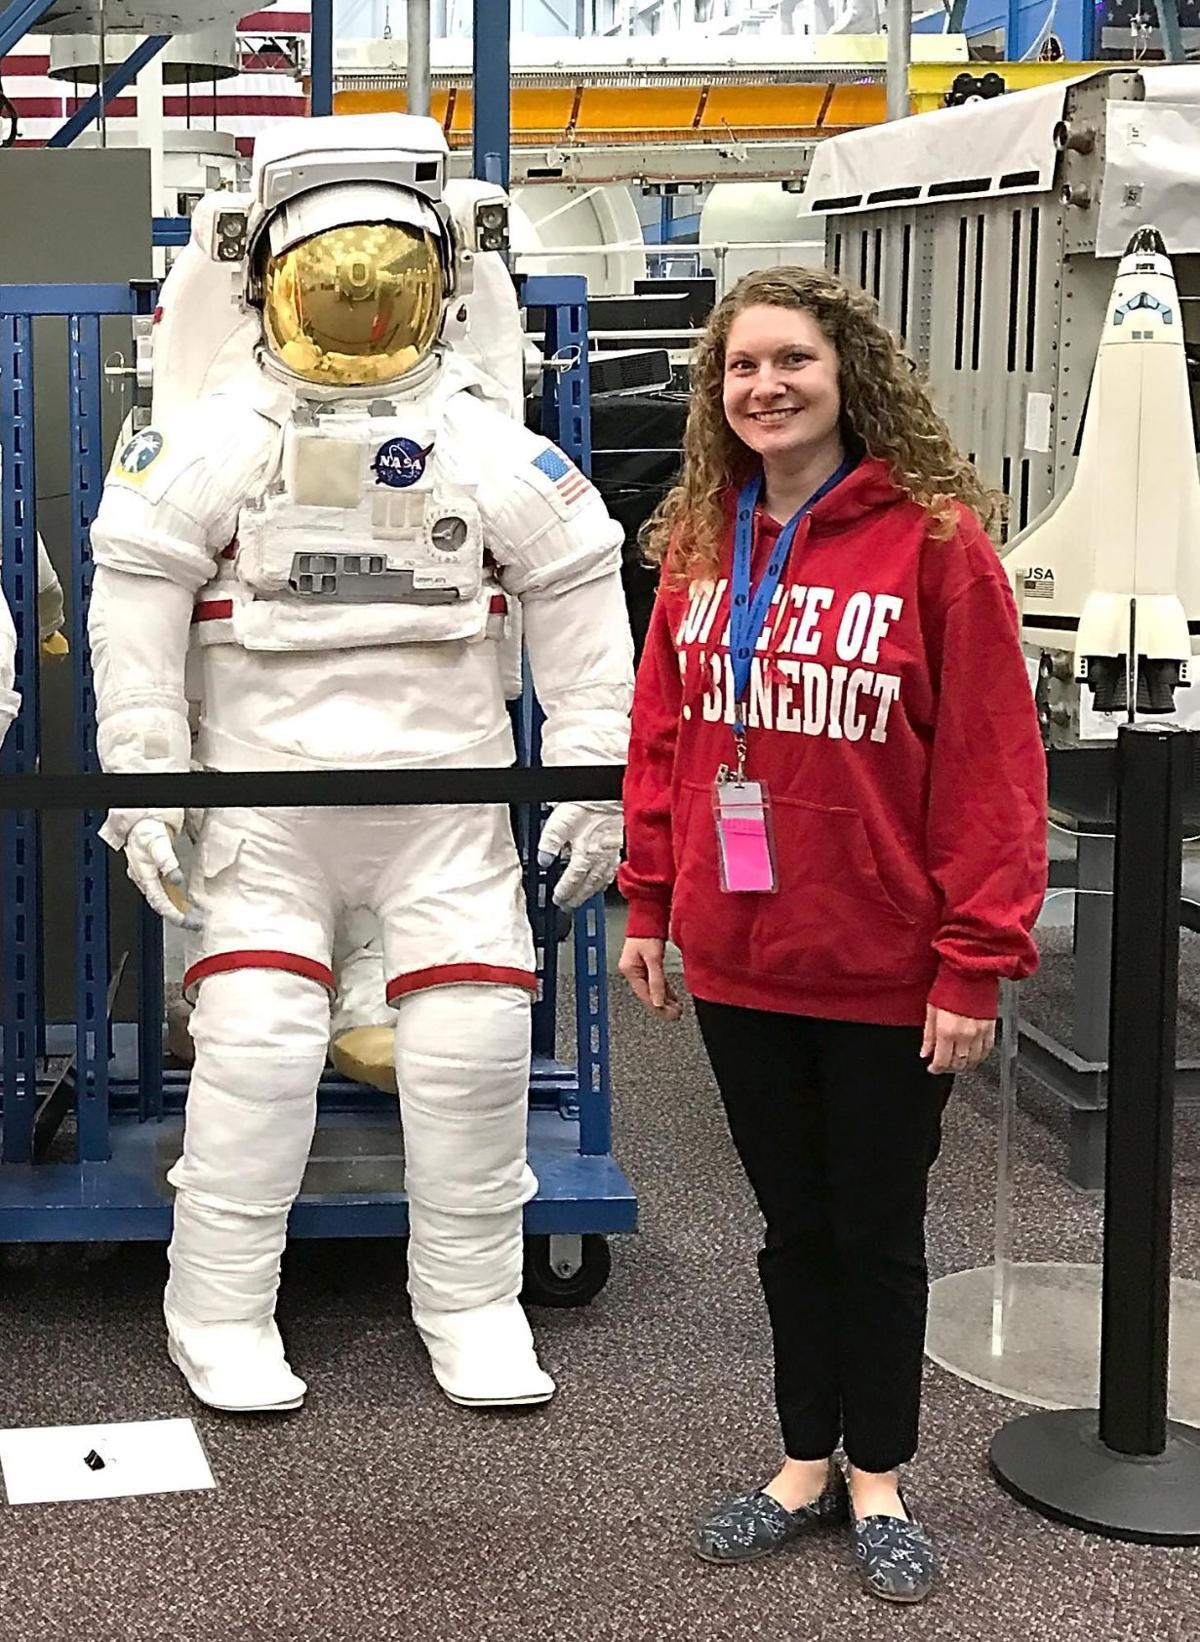 NASA teacher space suit